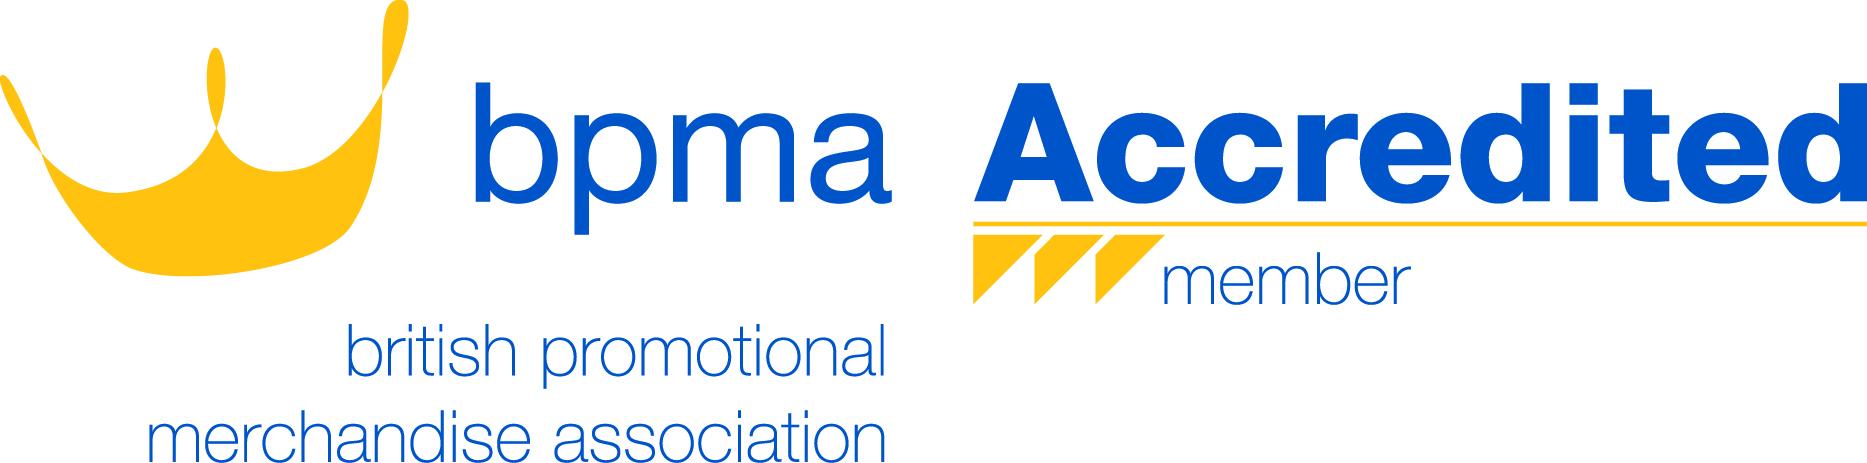 bpma Accredited Member CYMK